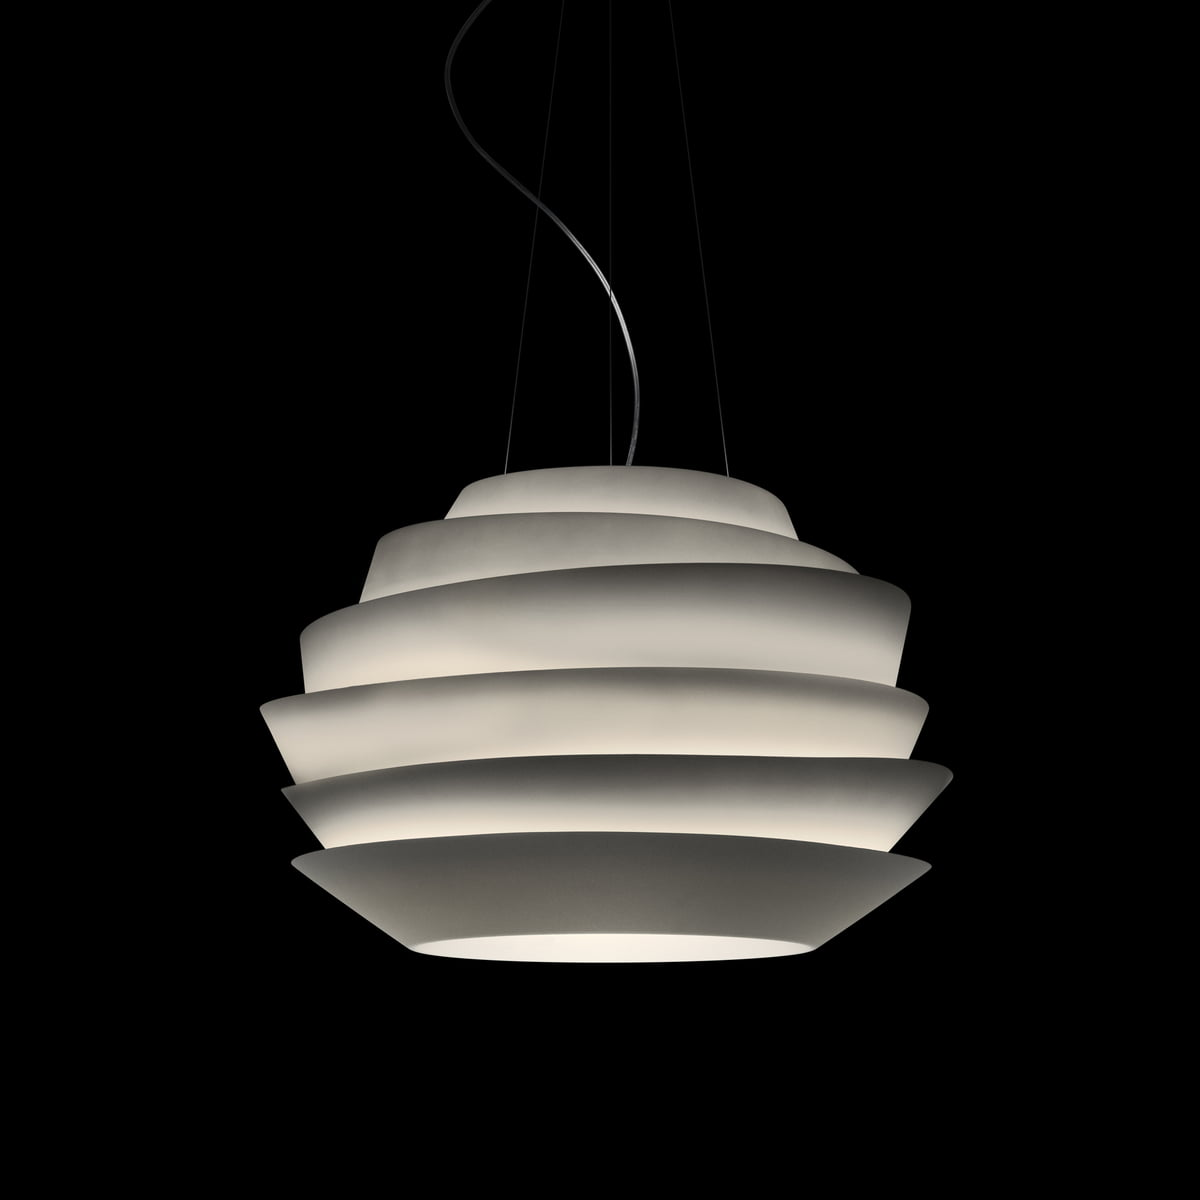 Le Soleil Suspension Lamp by Foscarini